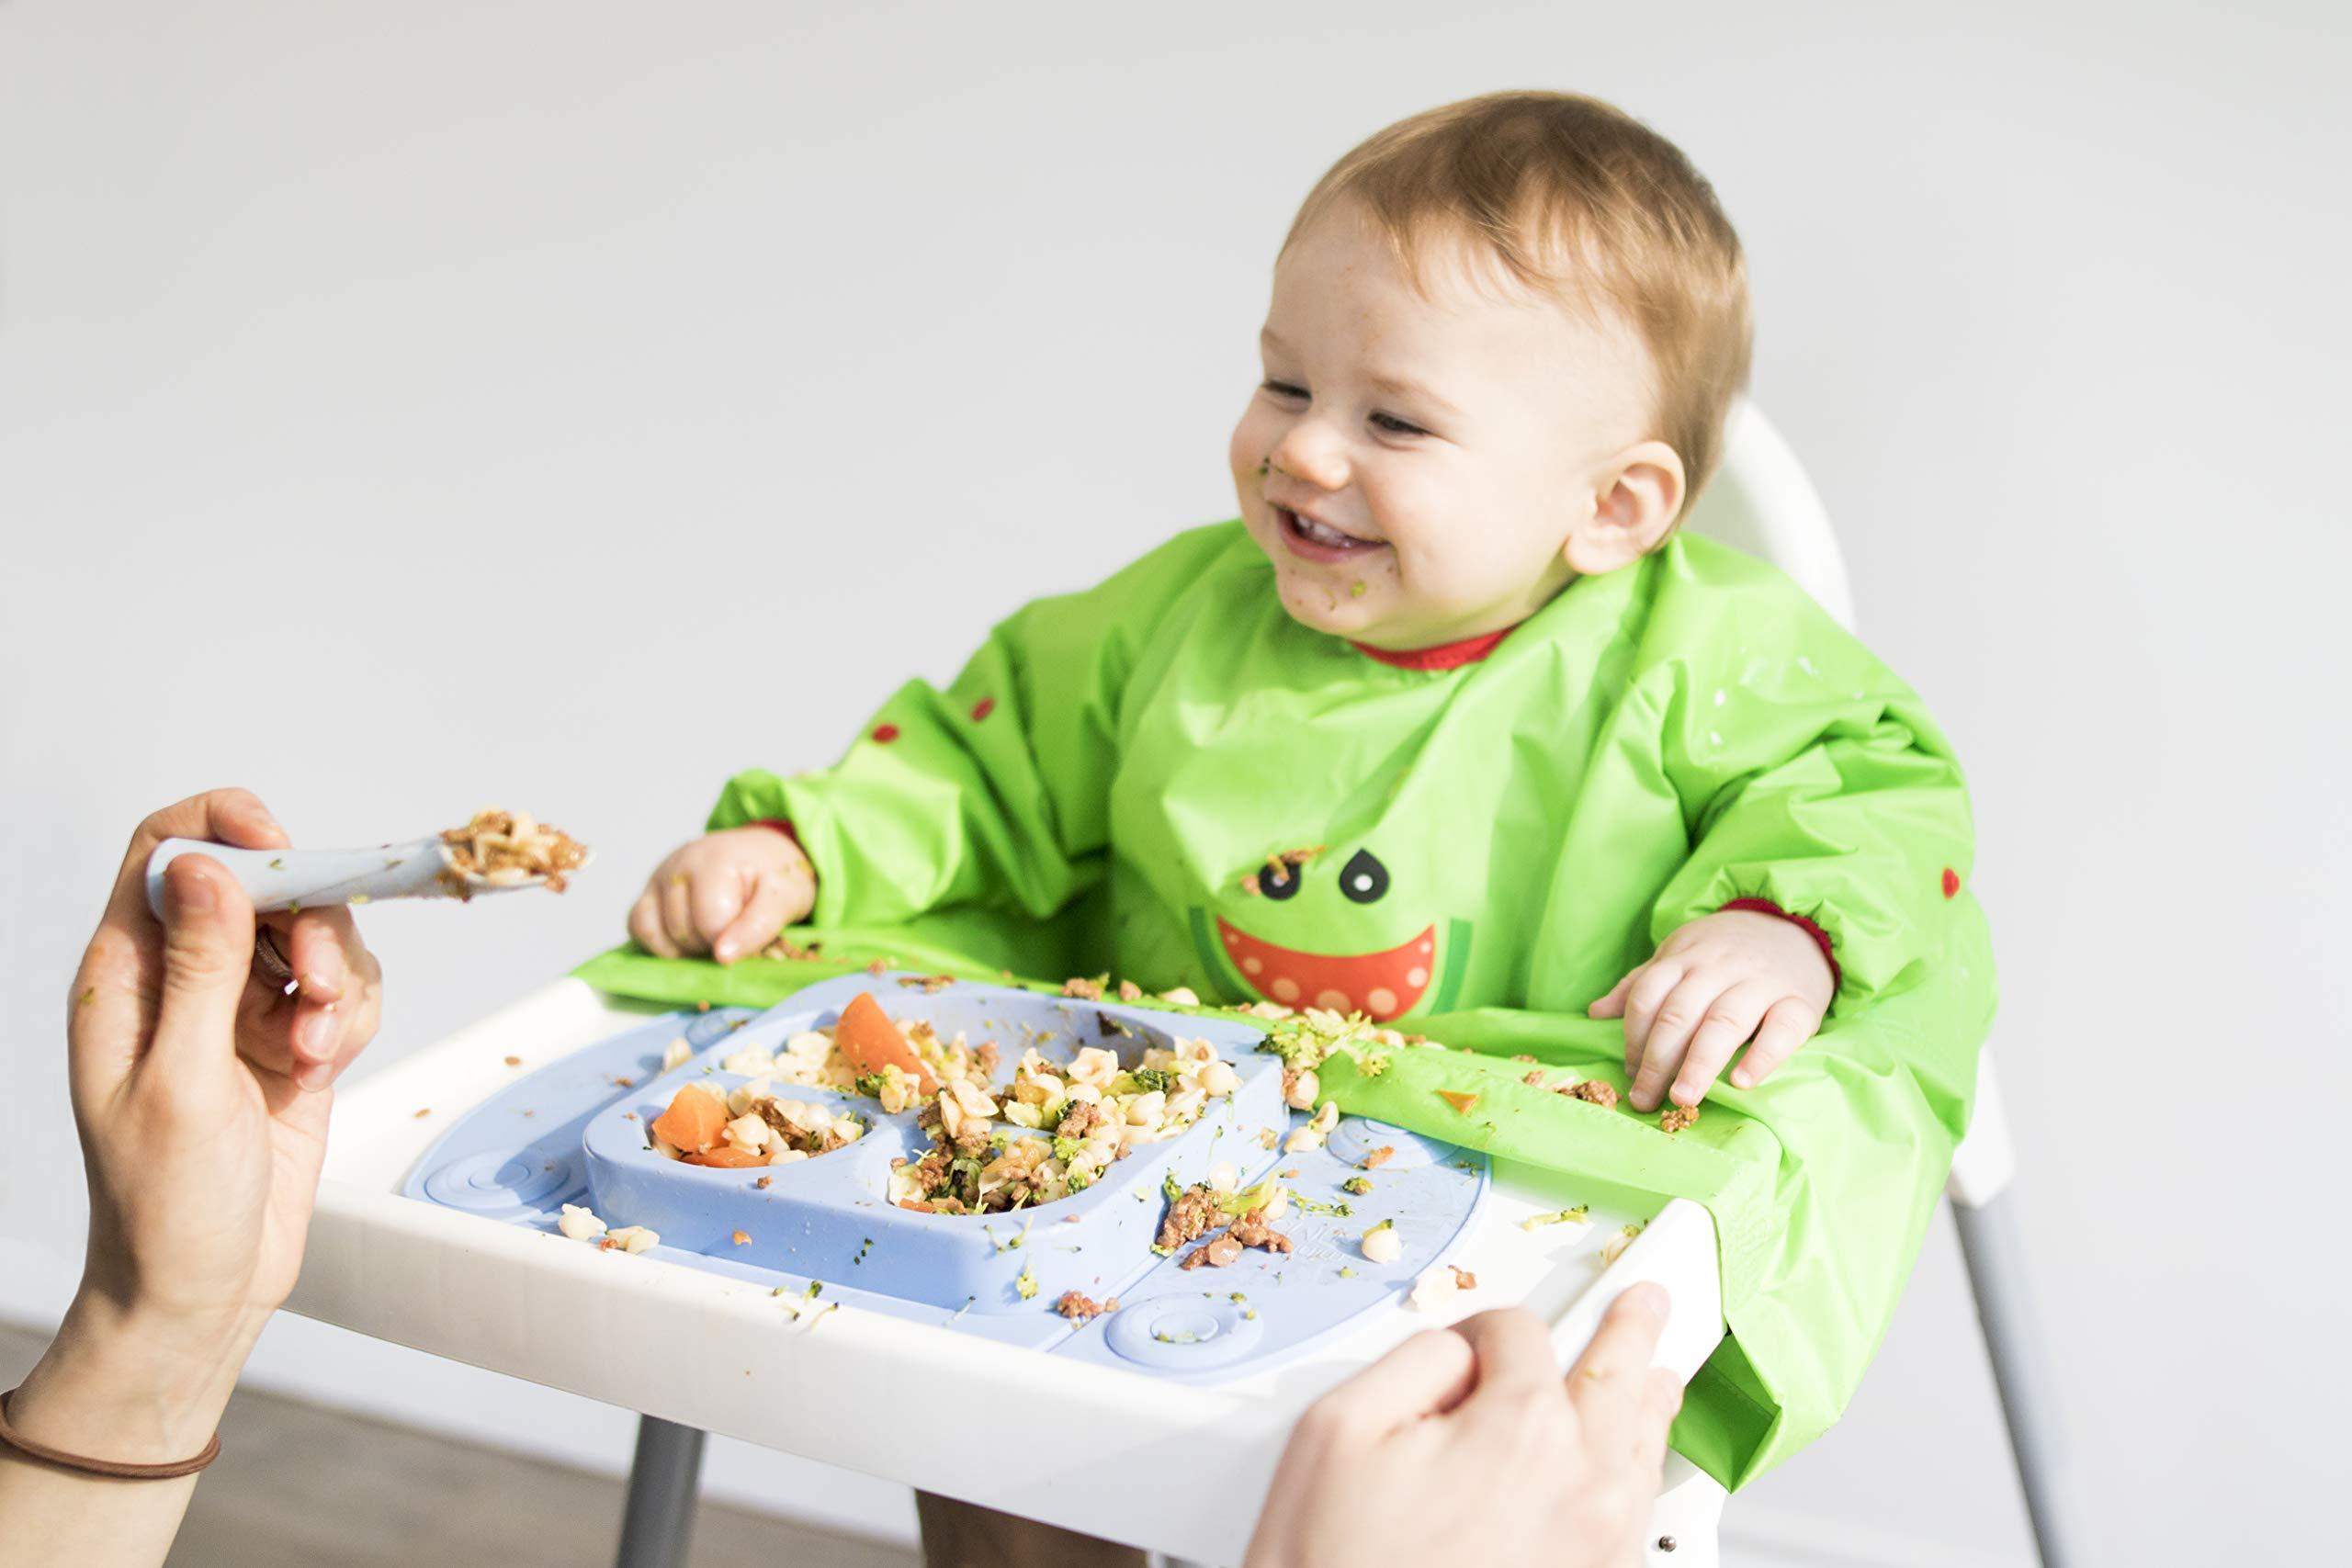 5 XL 4-5Years Bandana Bibs Cute Cartoon Baby Bibs Waterproof Infant Eating Children Drawing Long Sleeve Apron Baby Self Feeding Bib